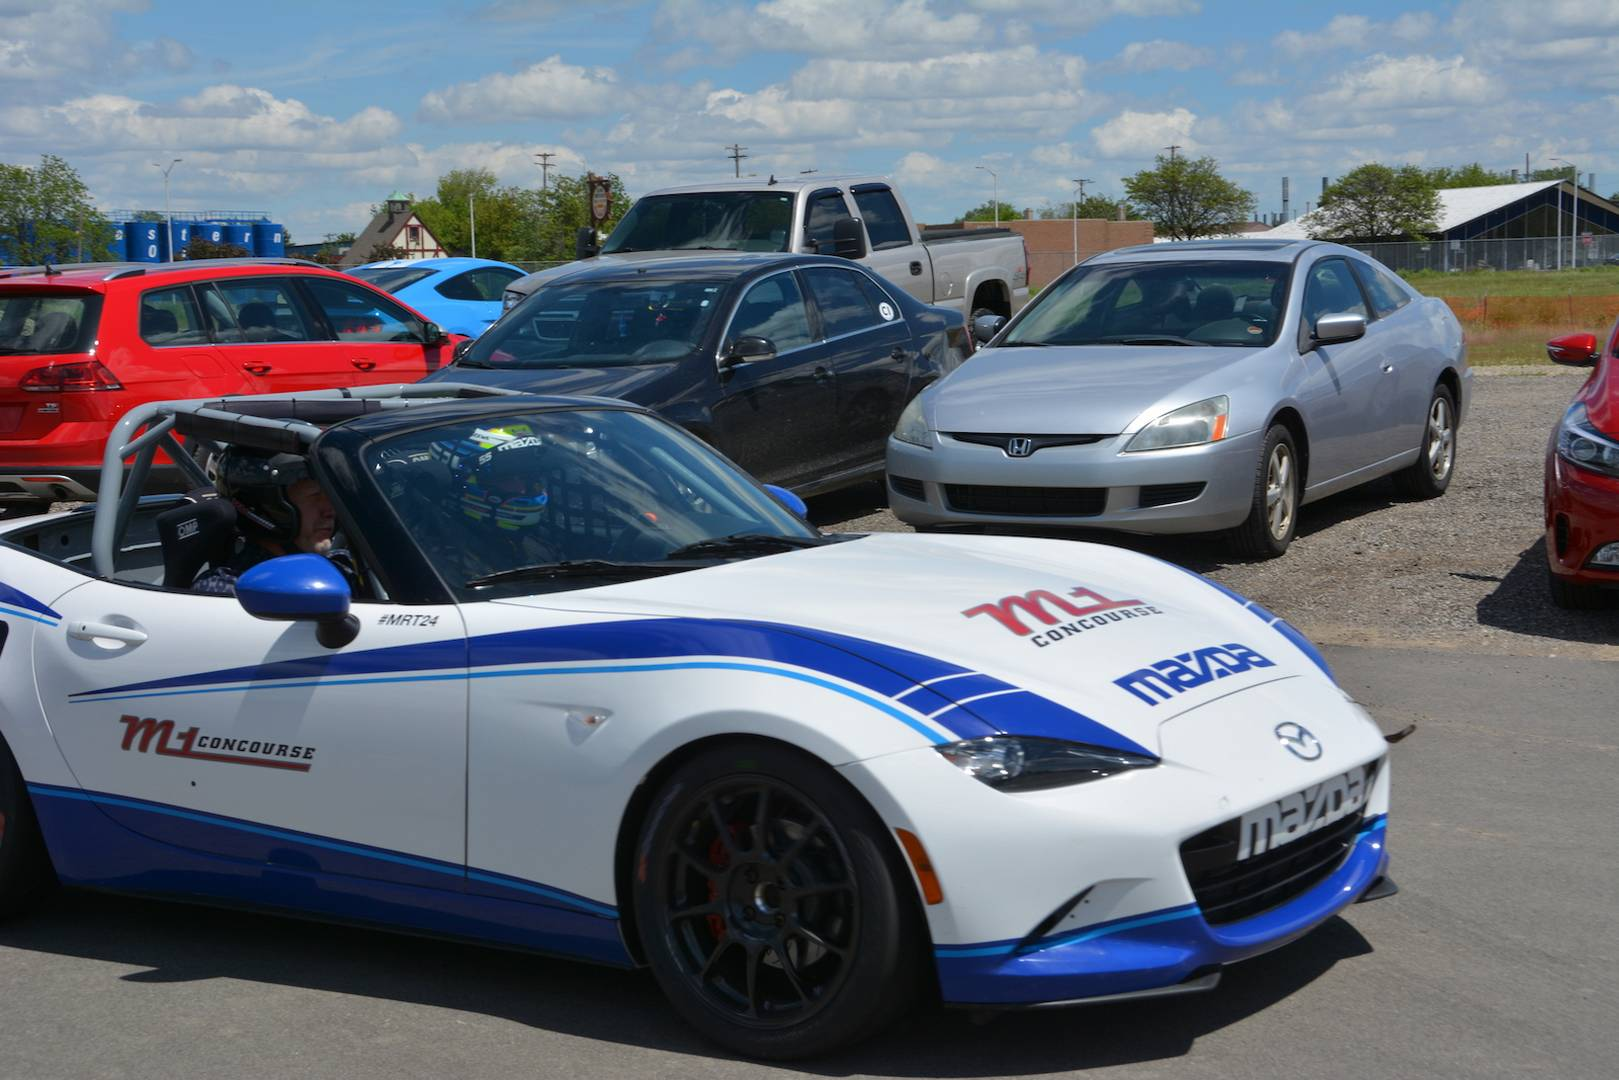 Mazda Global MX-5 Cup Car - First Drive! - GTspirit